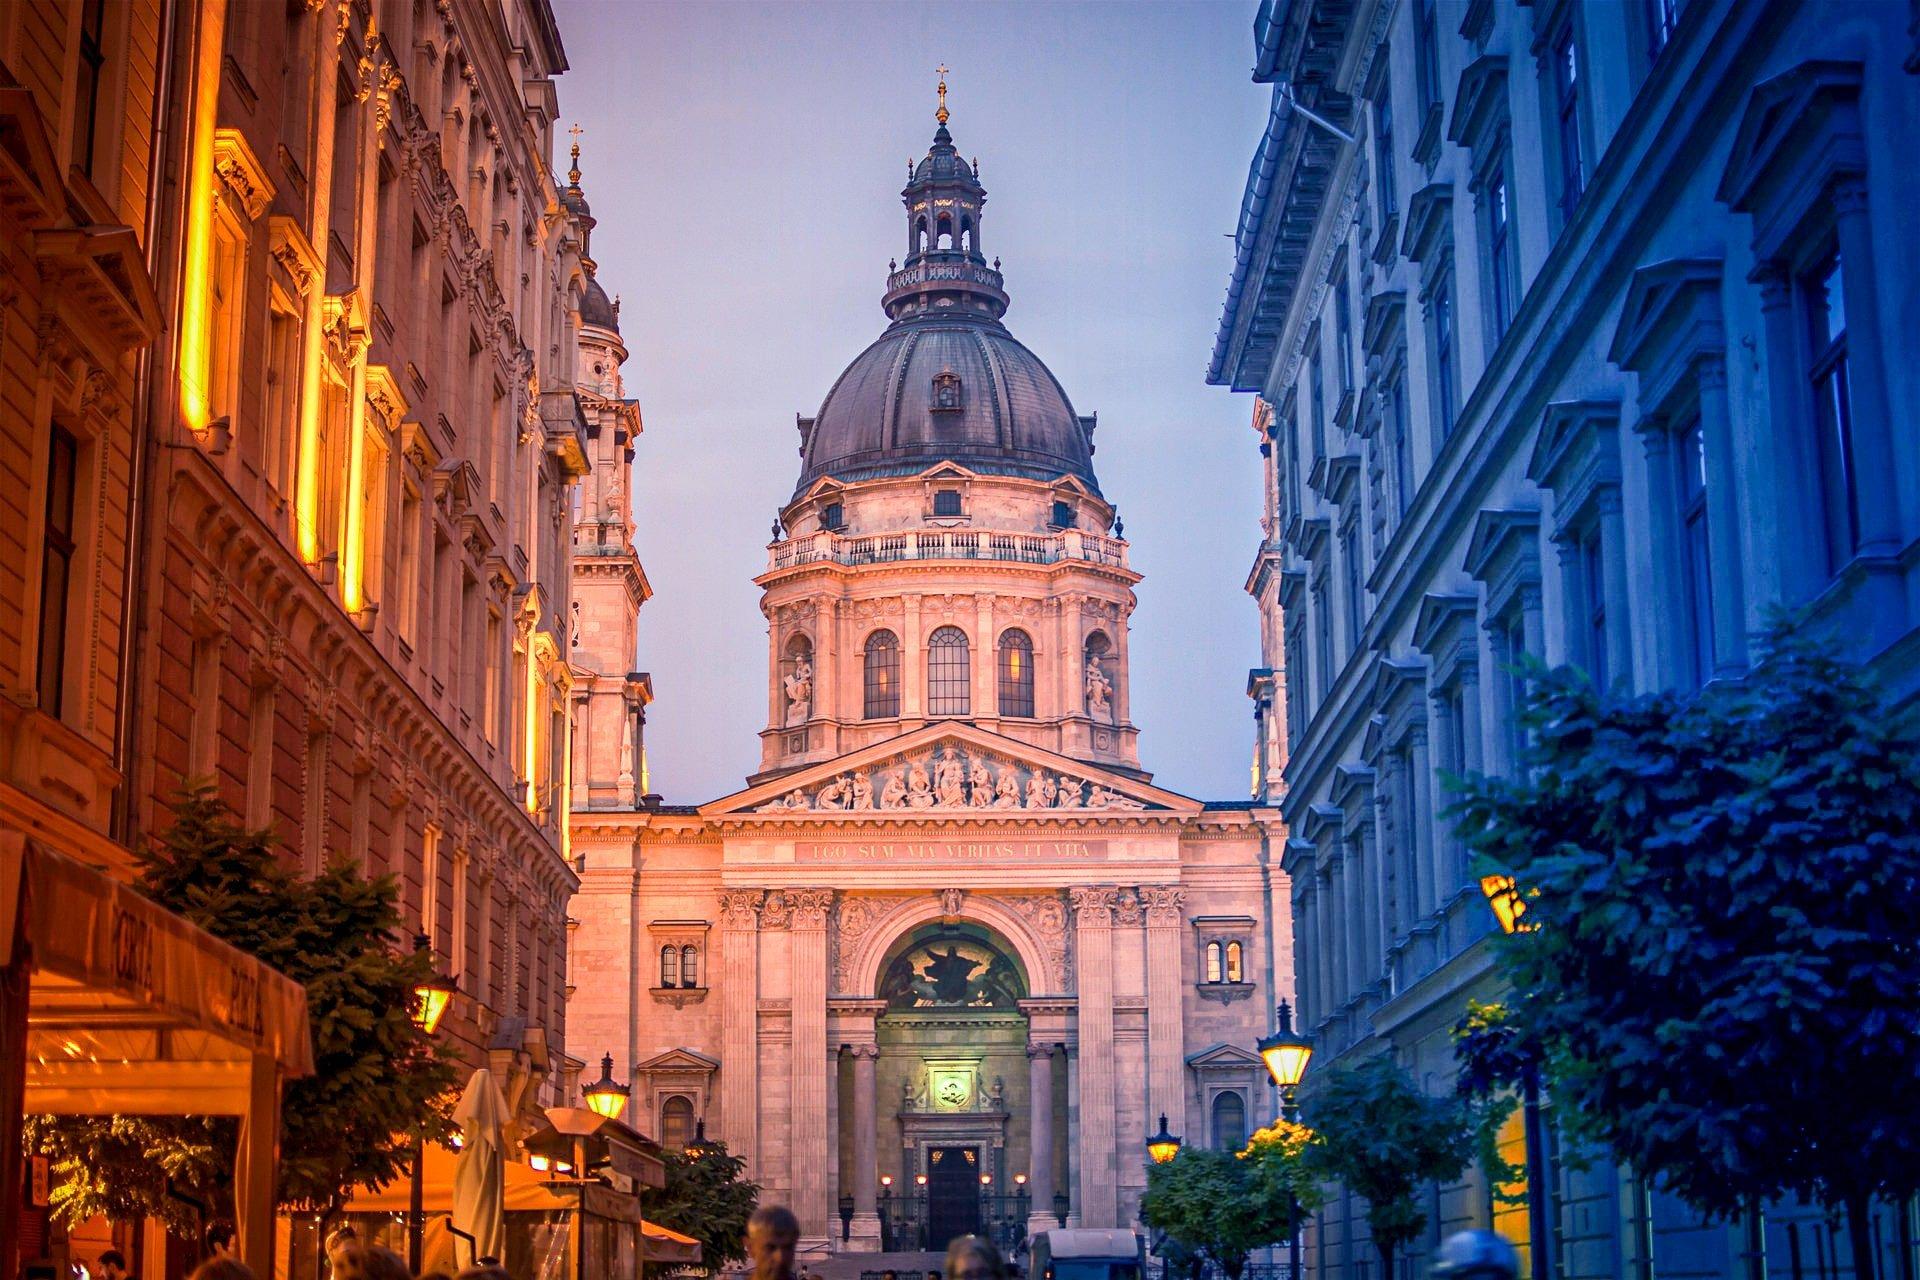 St. Stephen's Basilica in Pest - Budapest - sunset